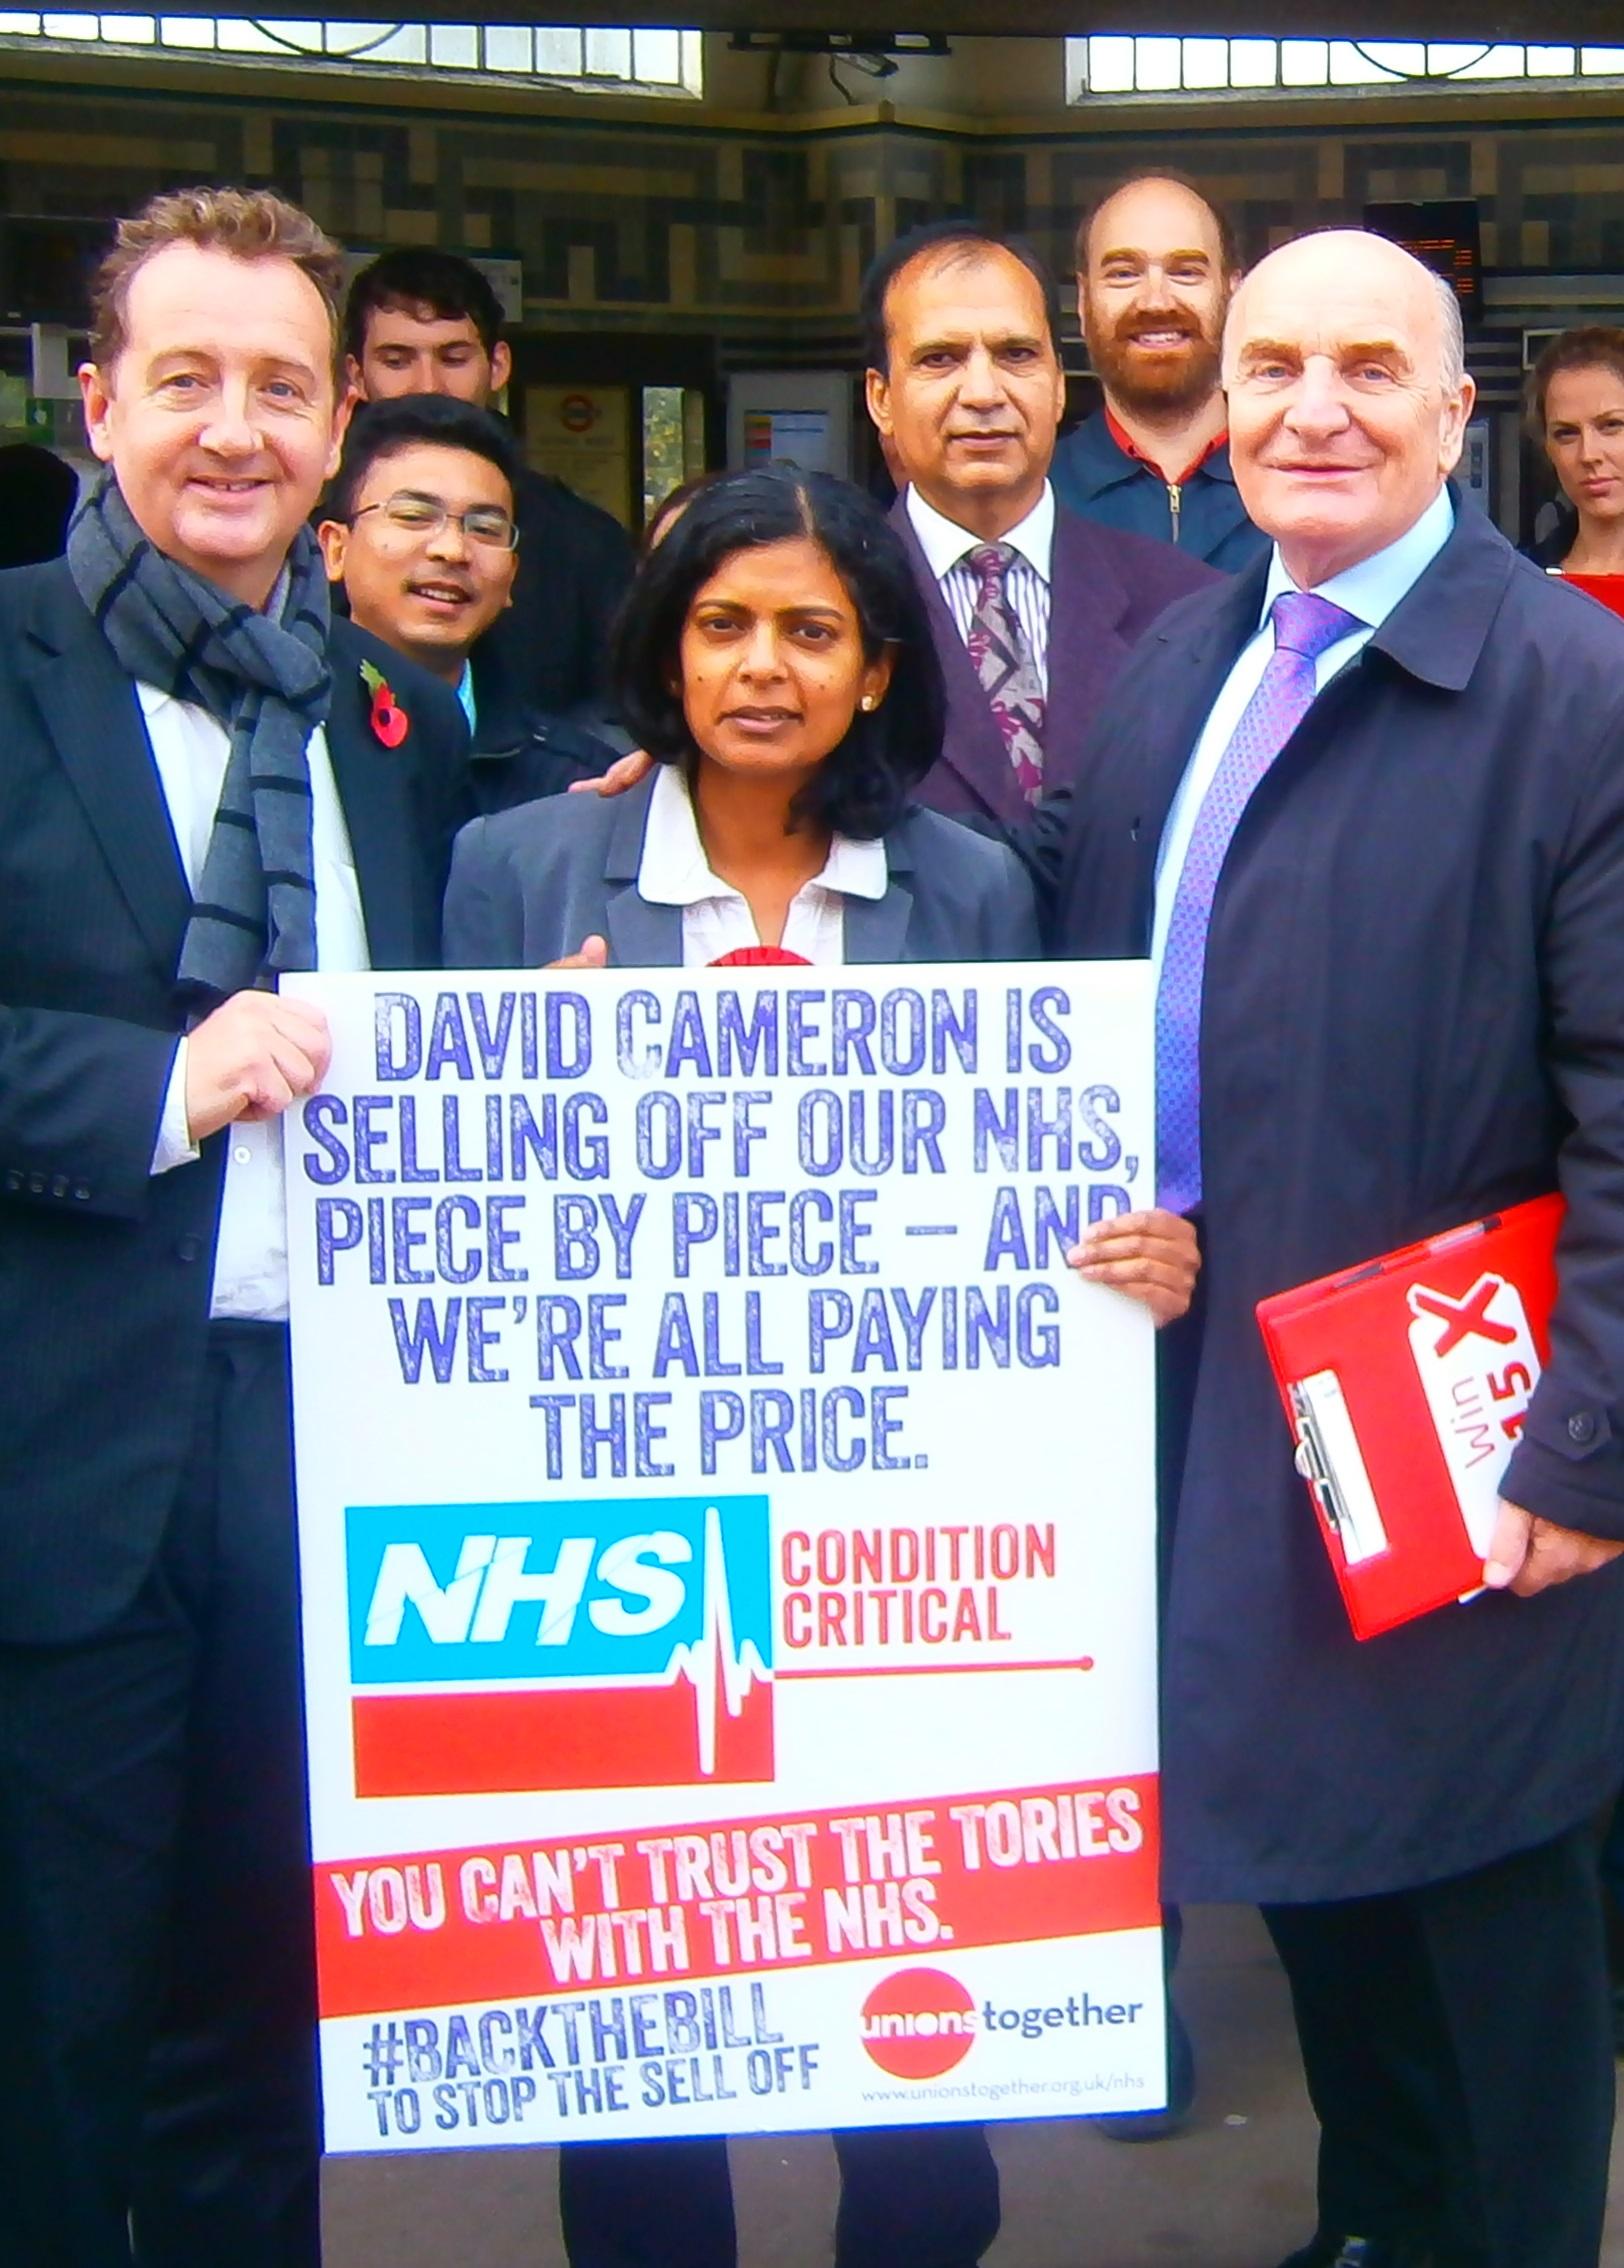 Rupa_NHS_Campaign.jpg